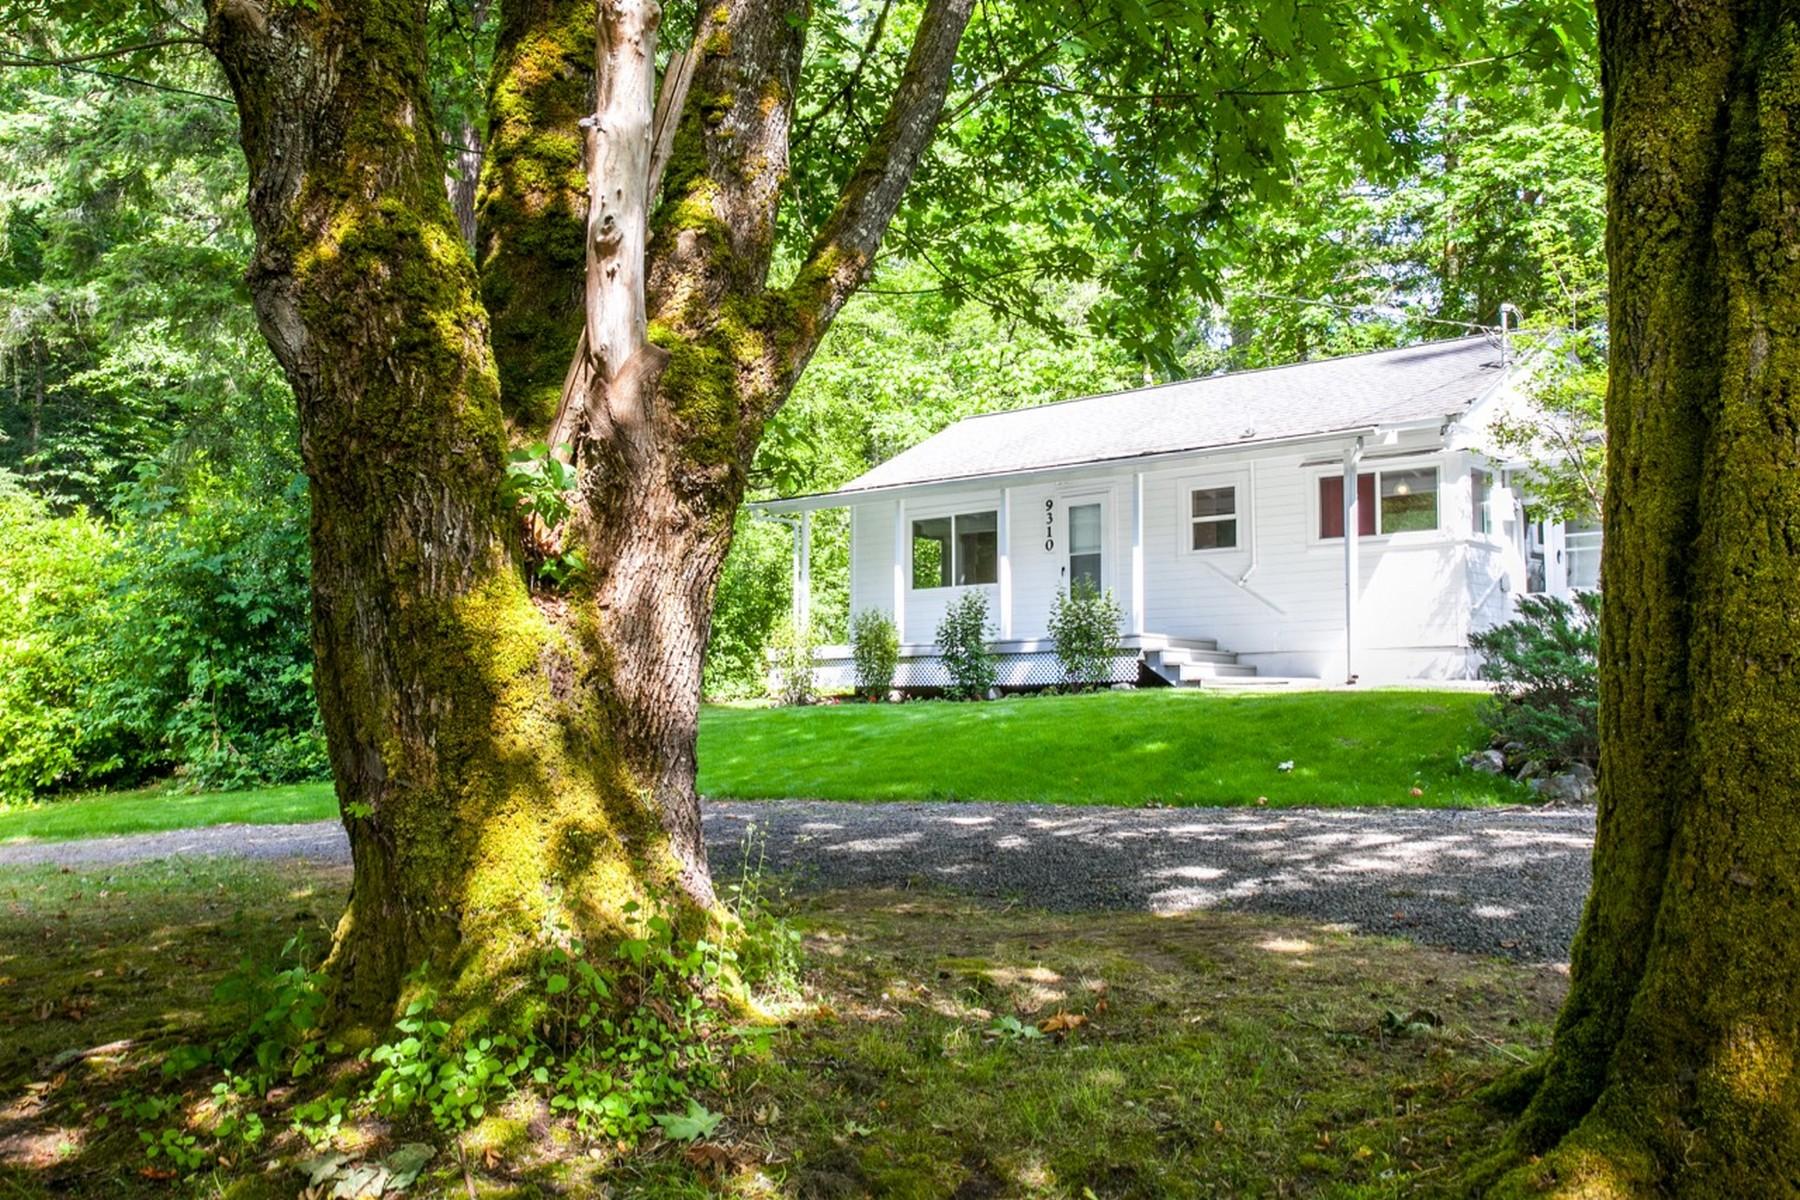 Villa per Vendita alle ore One Level on Bainbridge Island 9310 Miller Rd NE Bainbridge Island, Washington, 98110 Stati Uniti